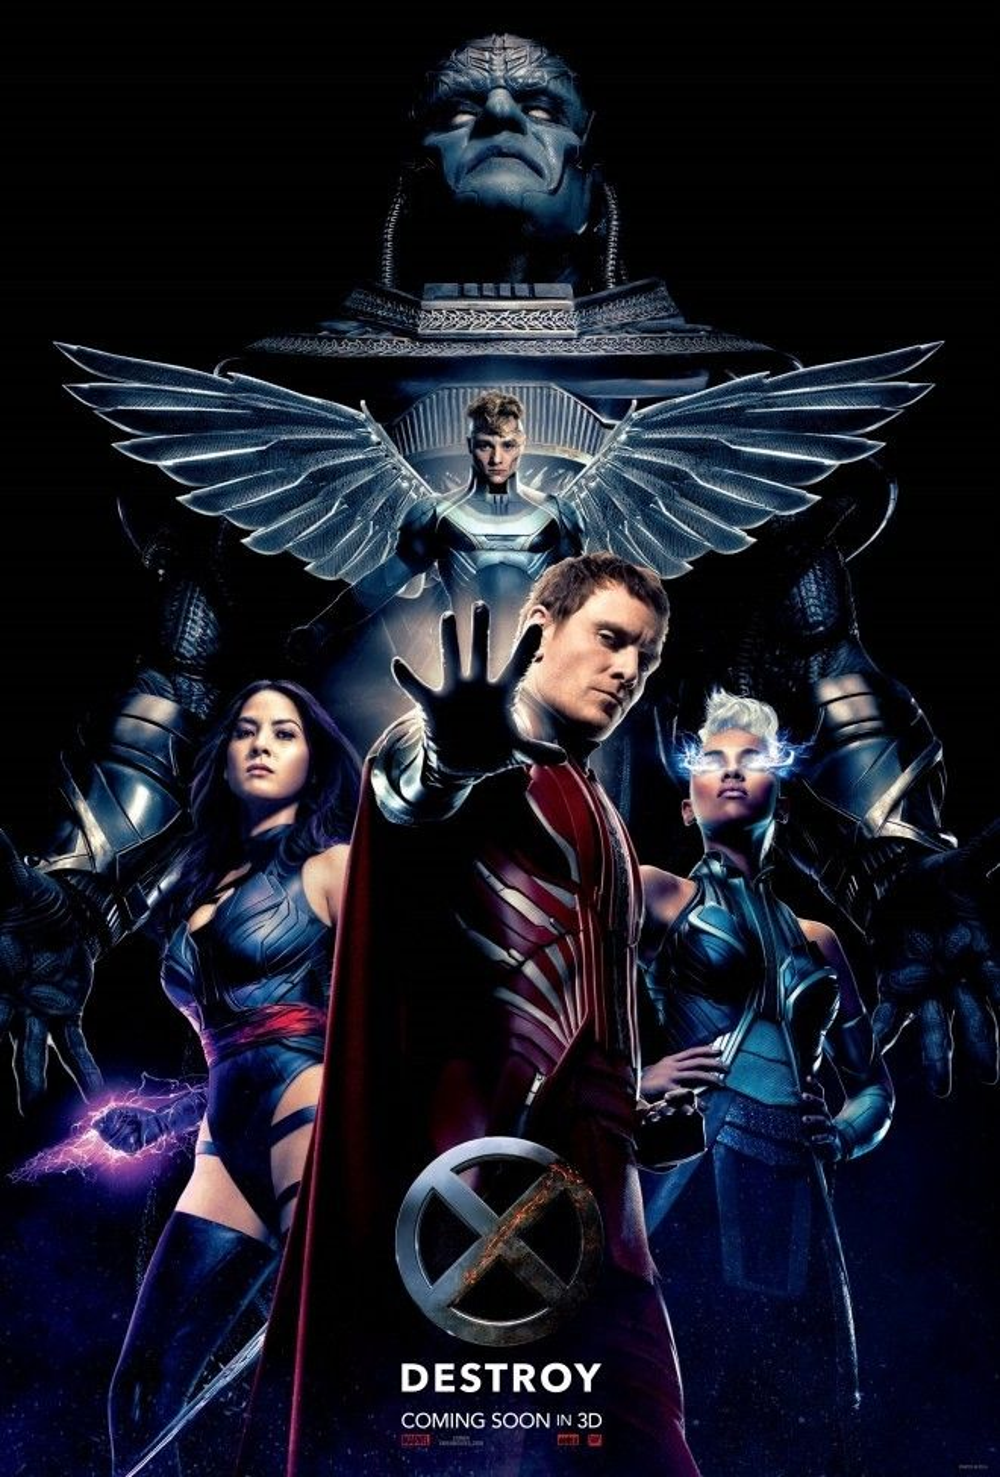 X-Men- New Poster Destroy